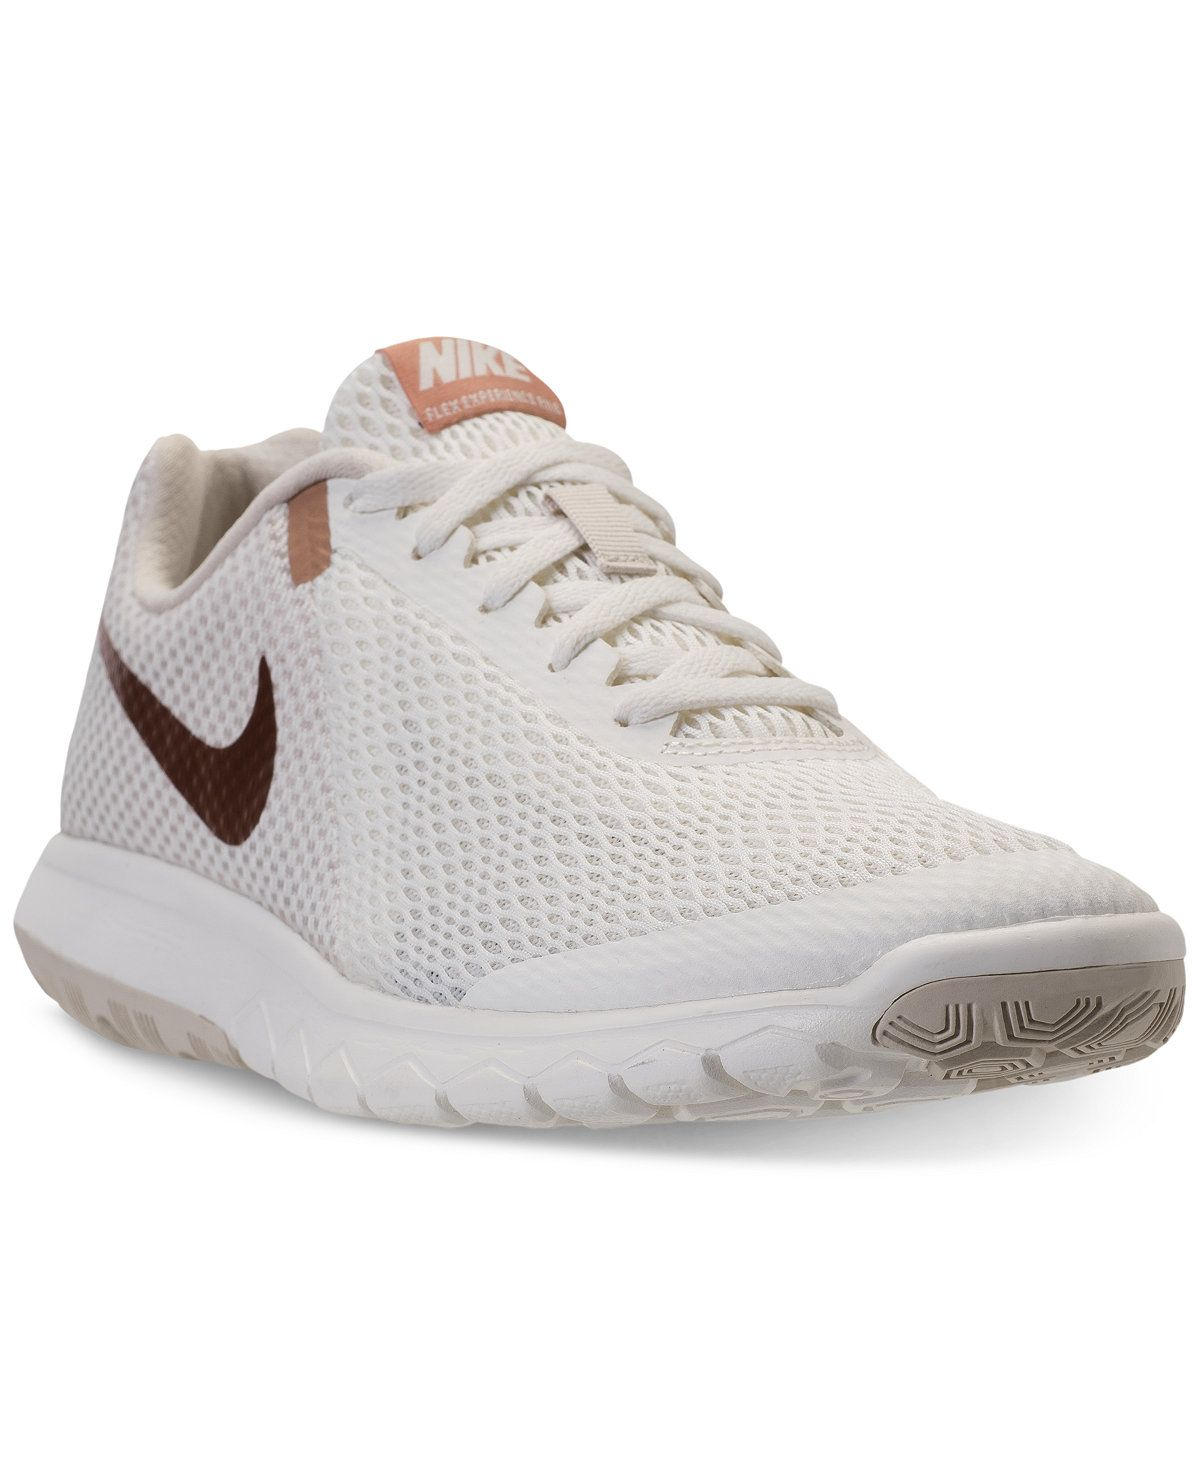 Nike Women s Flex Experience Run 6 Running Sneakers from Finish Line ... 472bcf526